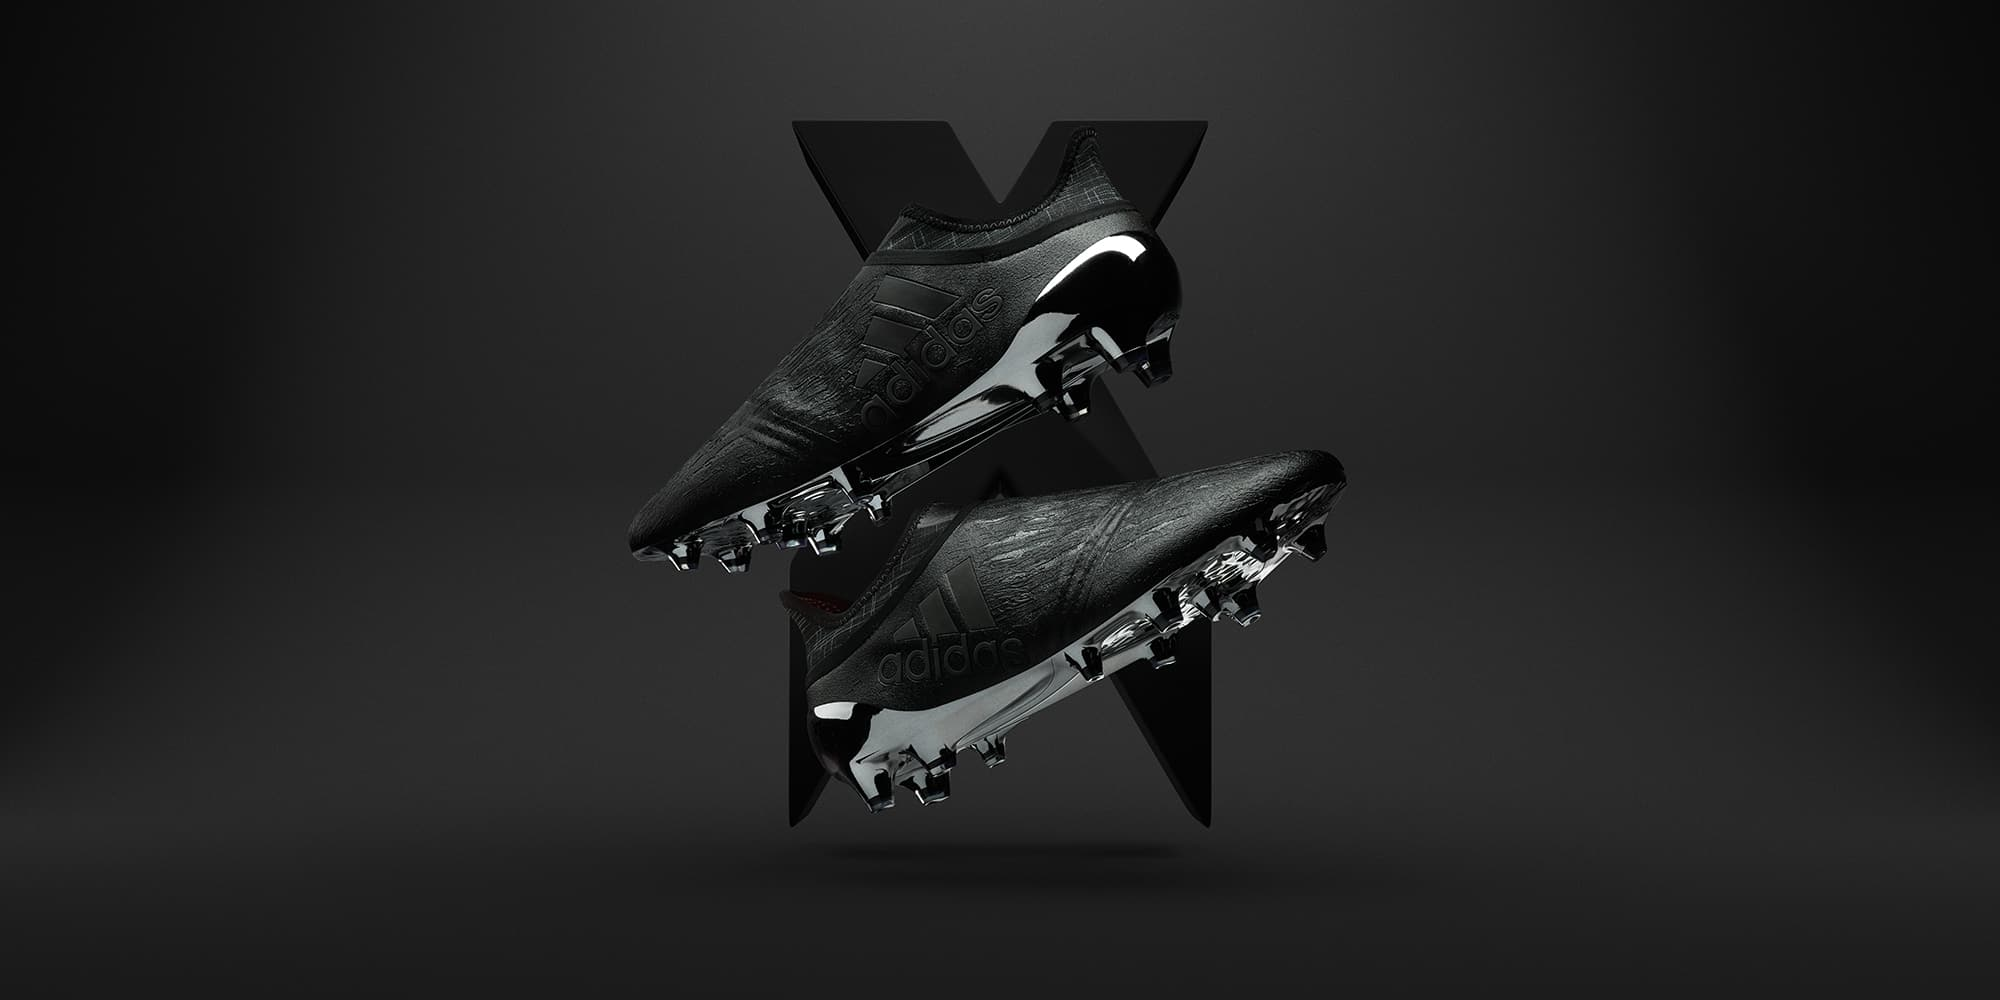 chaussure-football-adidas-X16-purechaos-darkspace-aout-2016-2